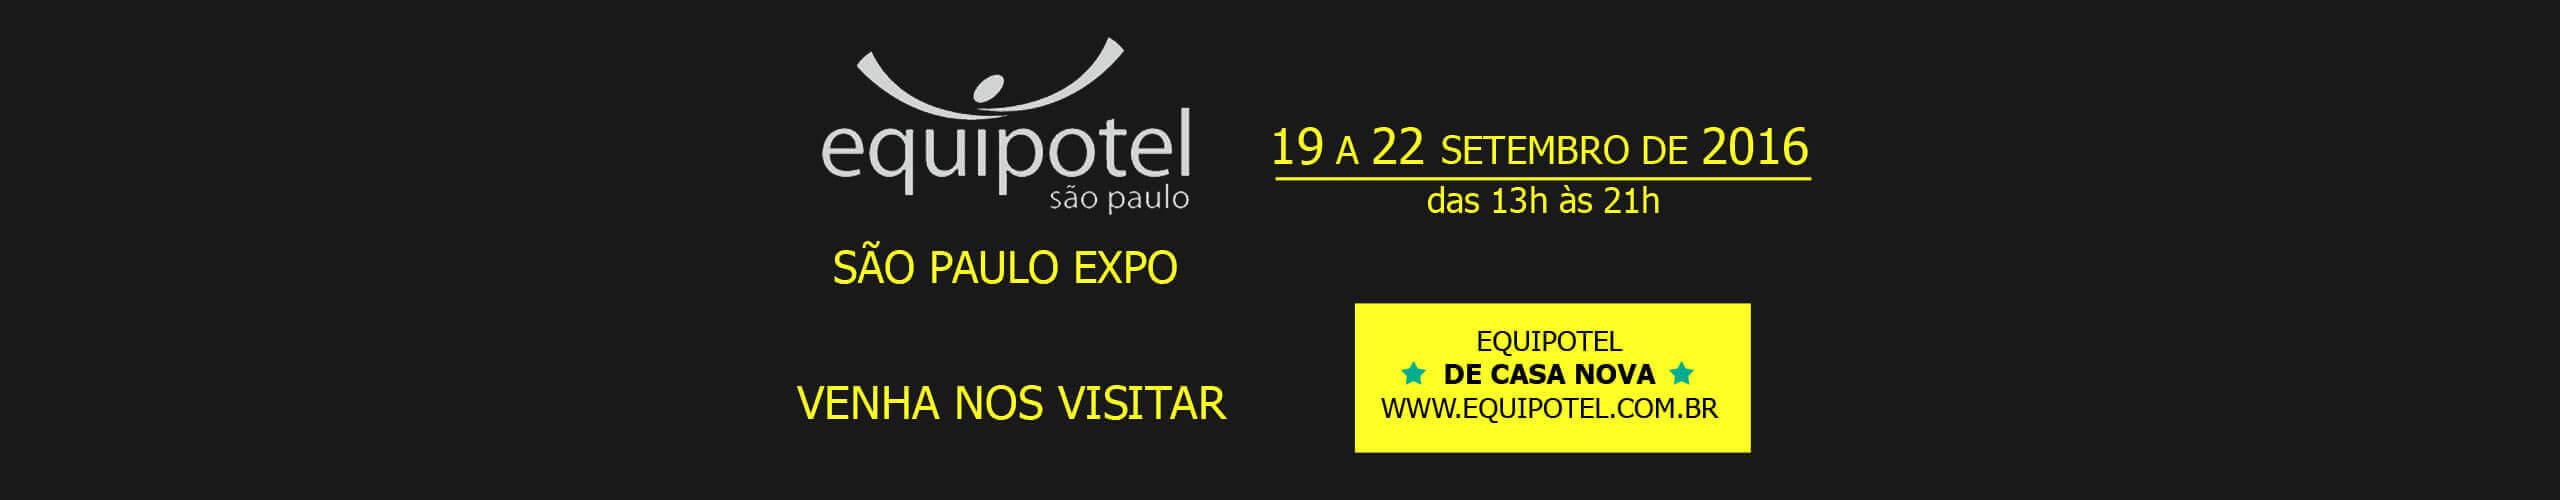 destaque-equipotel-2016-500-2